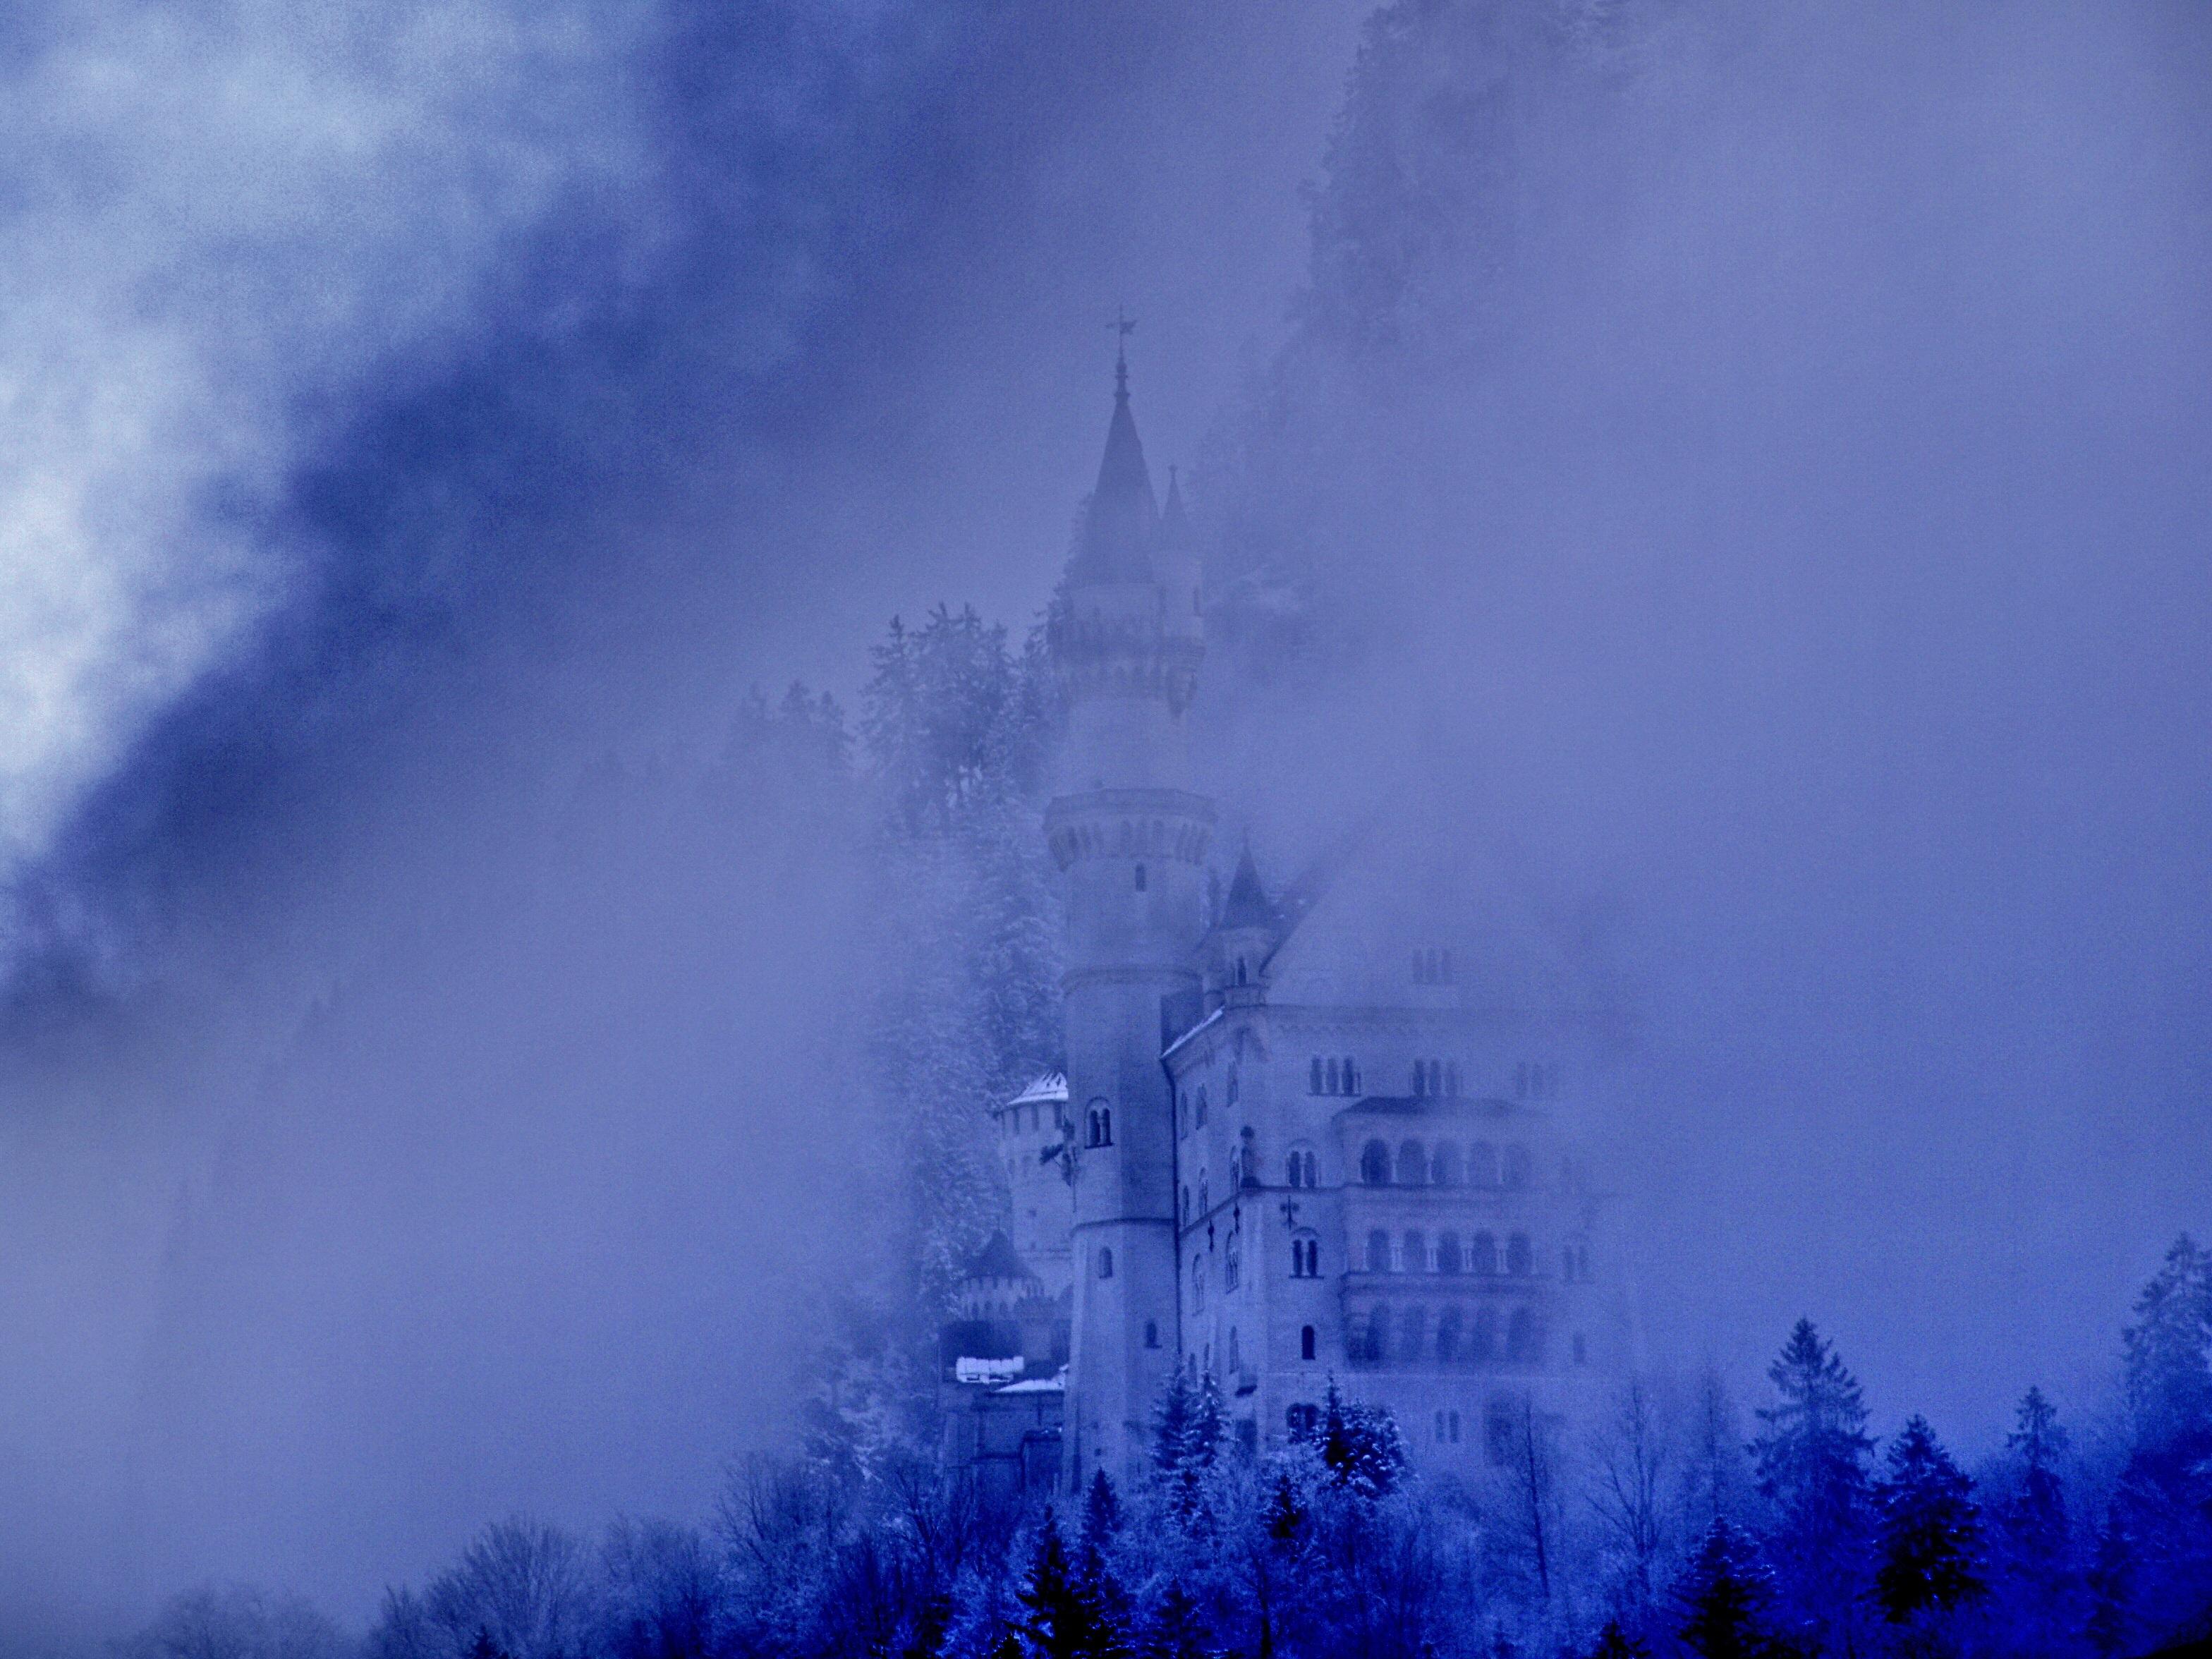 туман и архитектура фотографии ильинична электротехнический институт